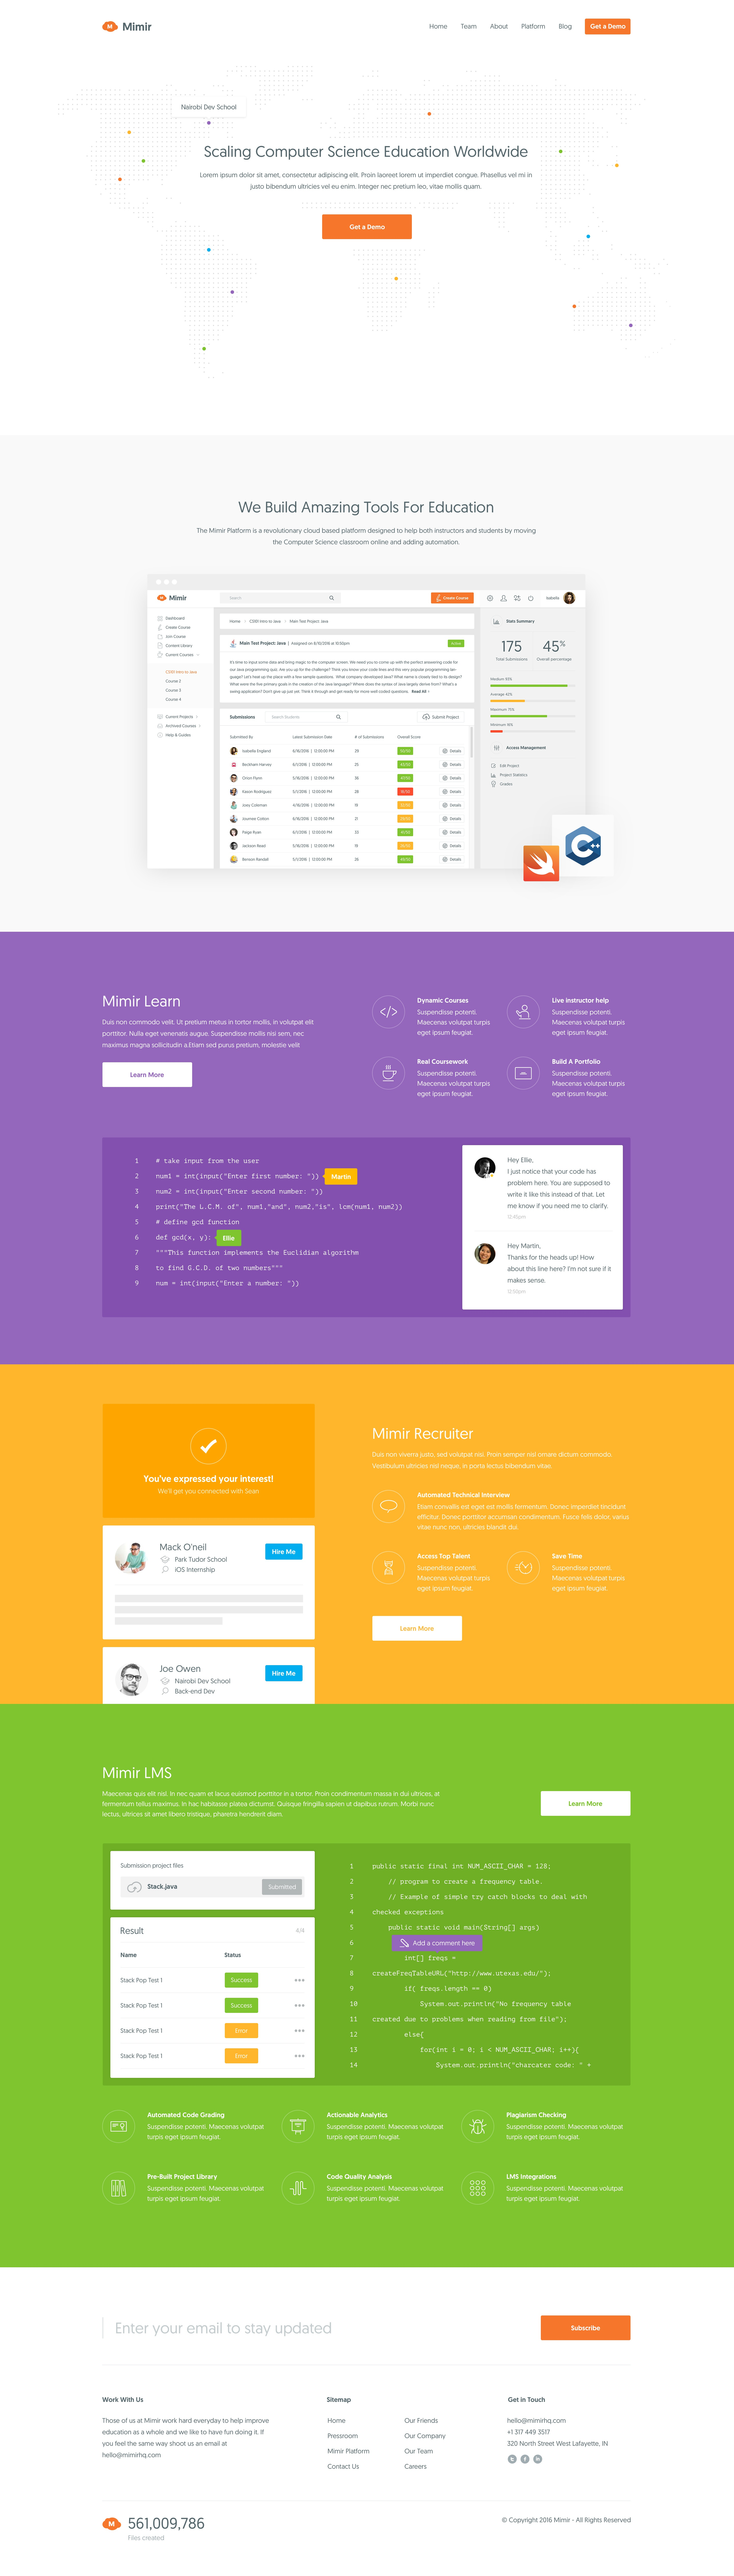 Mimir website hifi 2x